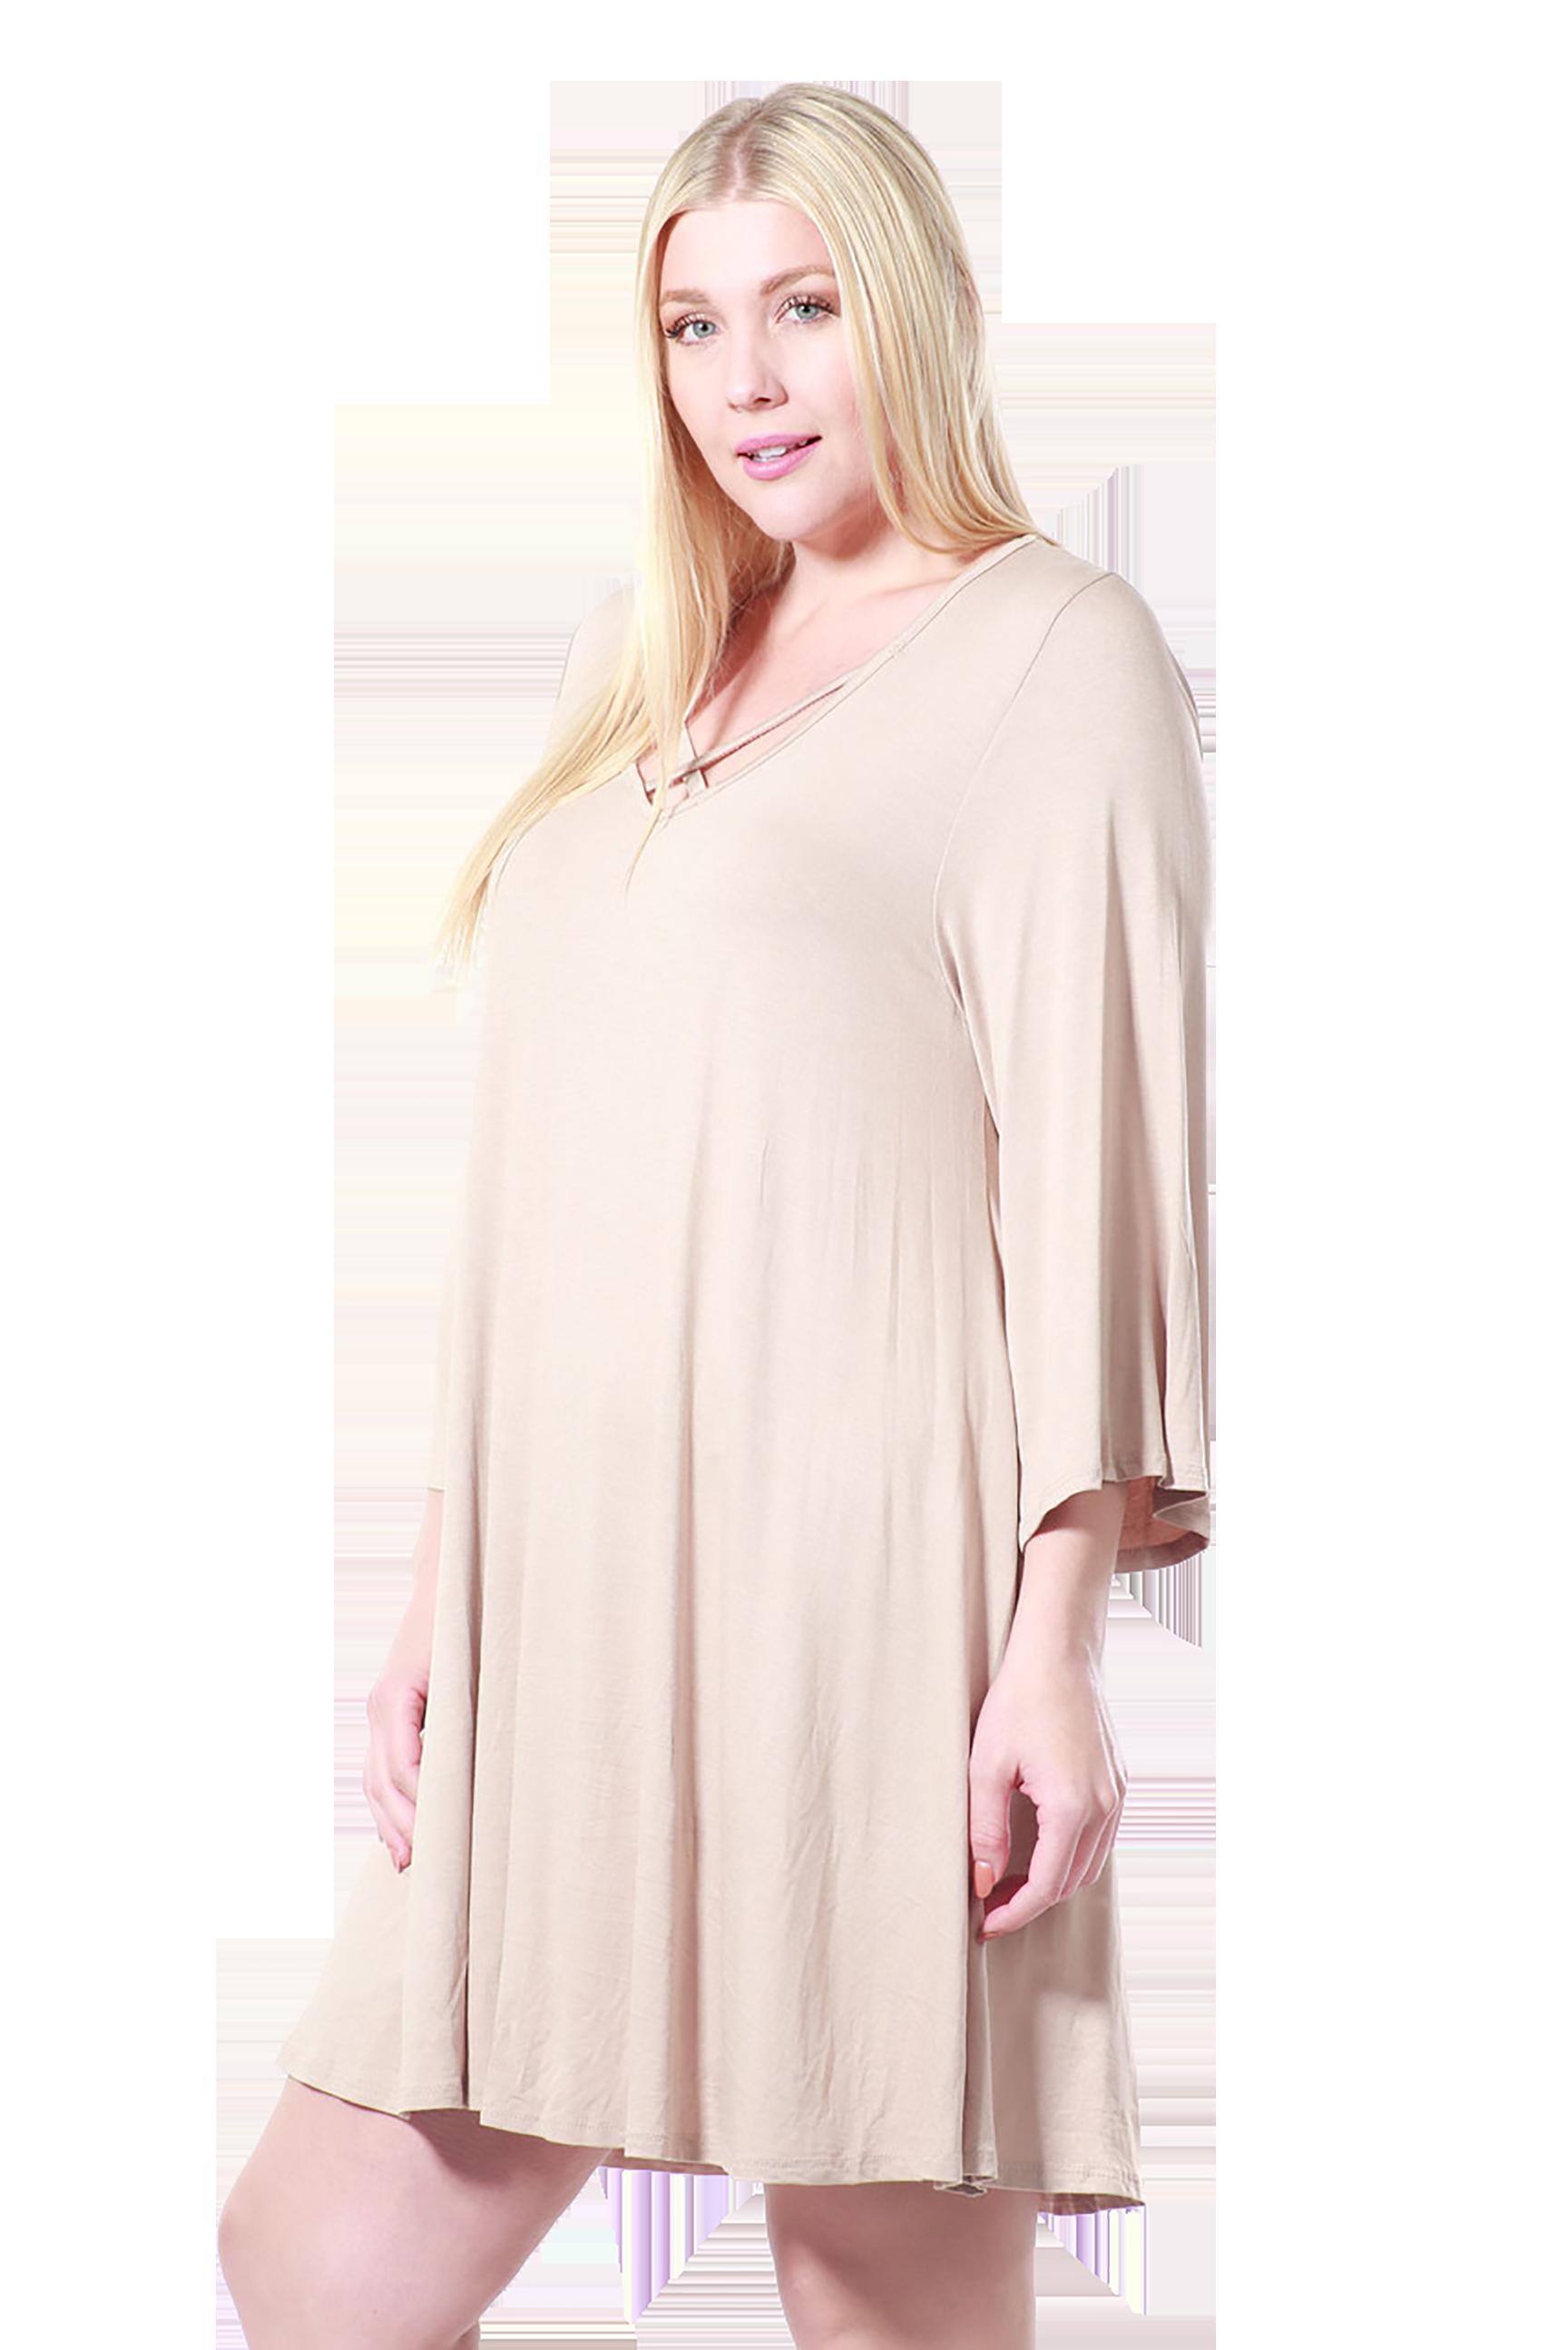 Women's Plus Size Drawstring Half Sleeve Blouse Dress Made in USA 1X 2X 3X – Black / 1XL